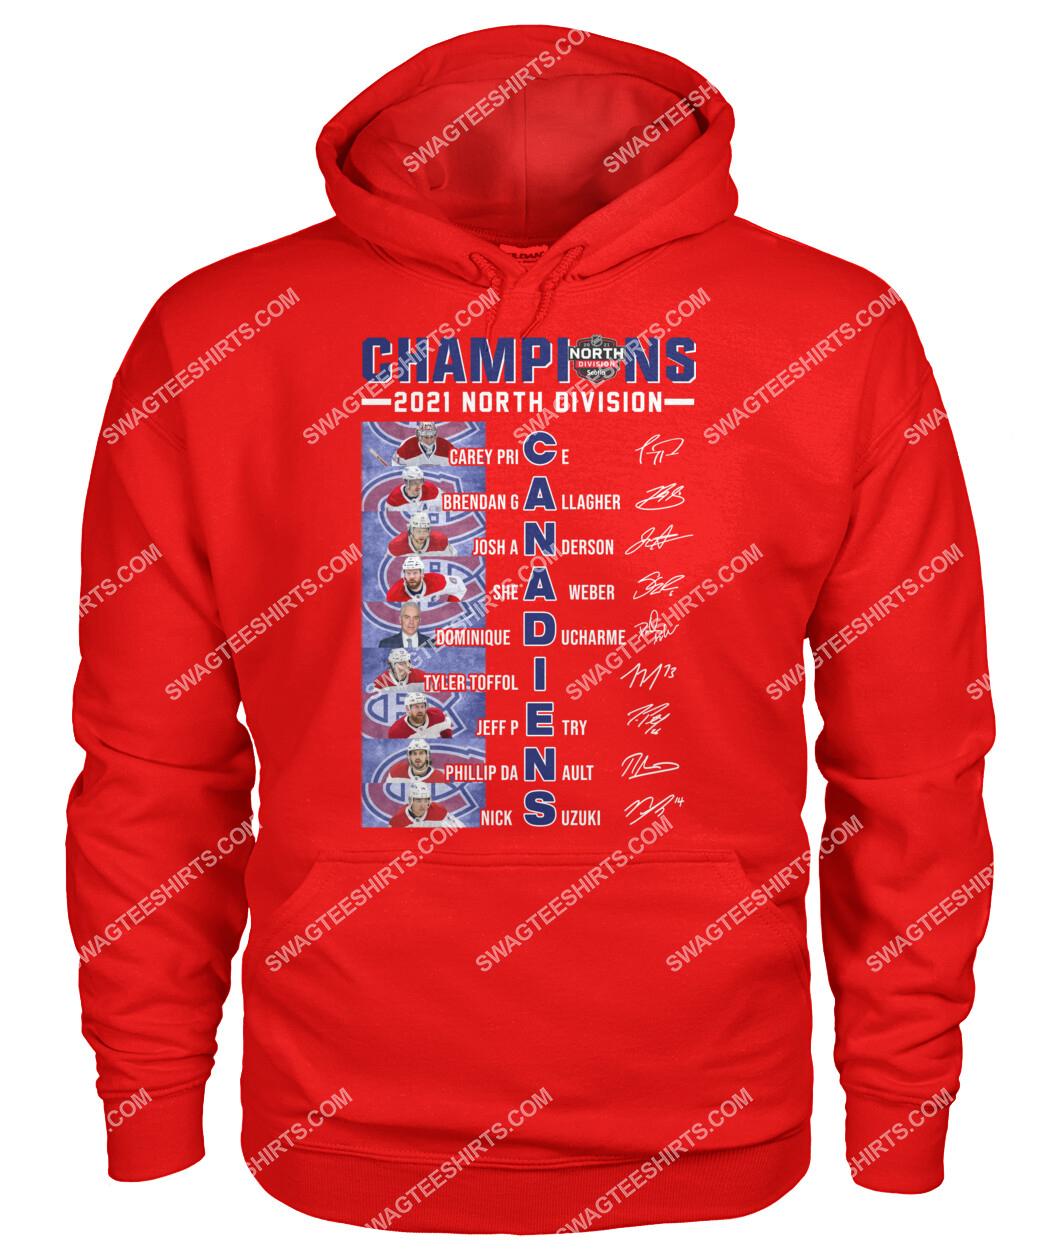 2021 north division champions montreal canadiens signatures hoodie 1